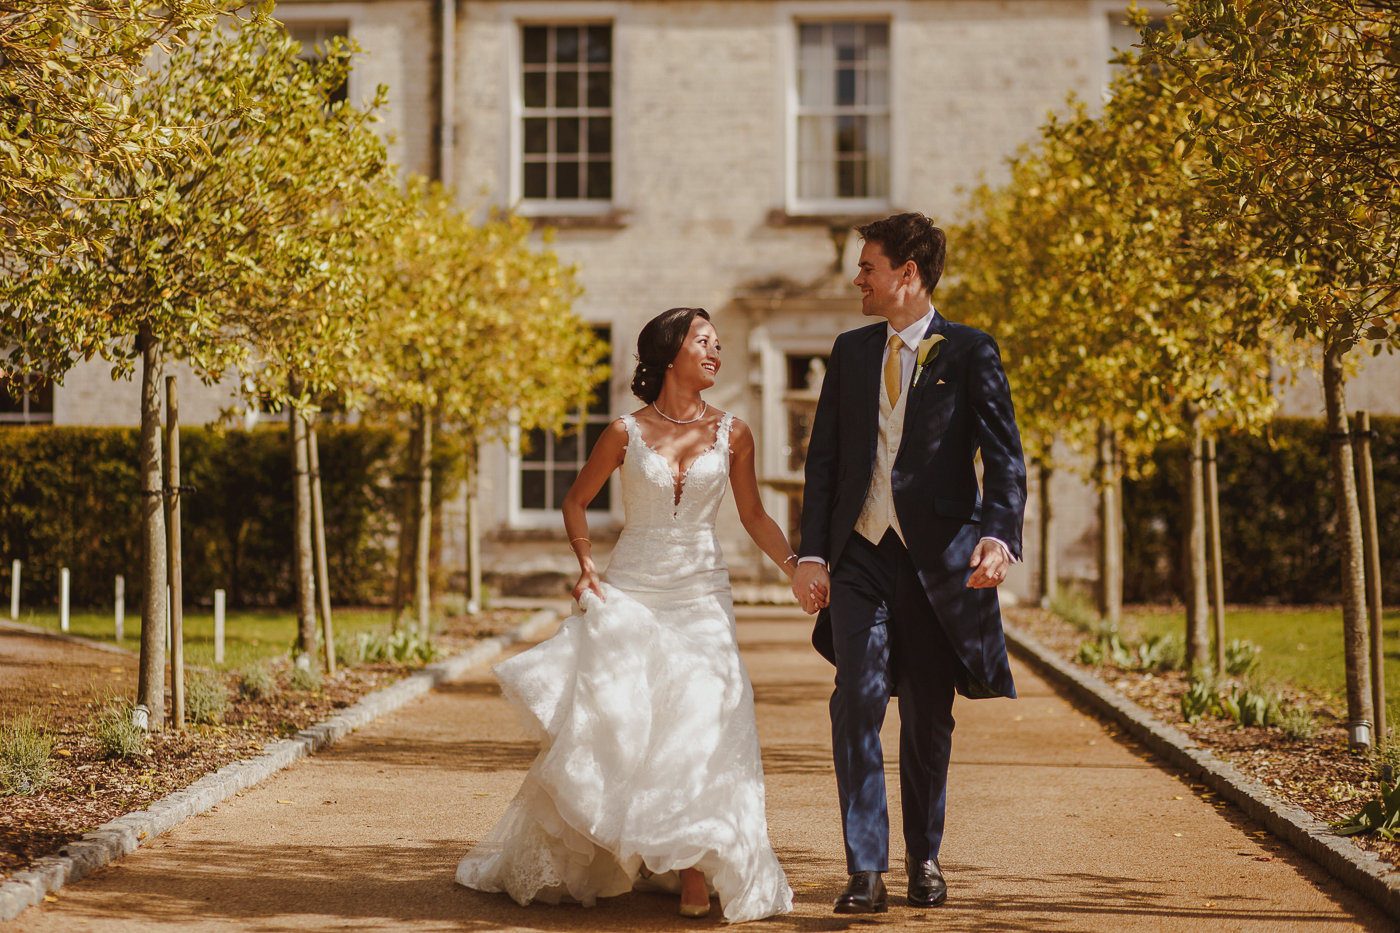 froyle-park-wedding-photography-30.jpg